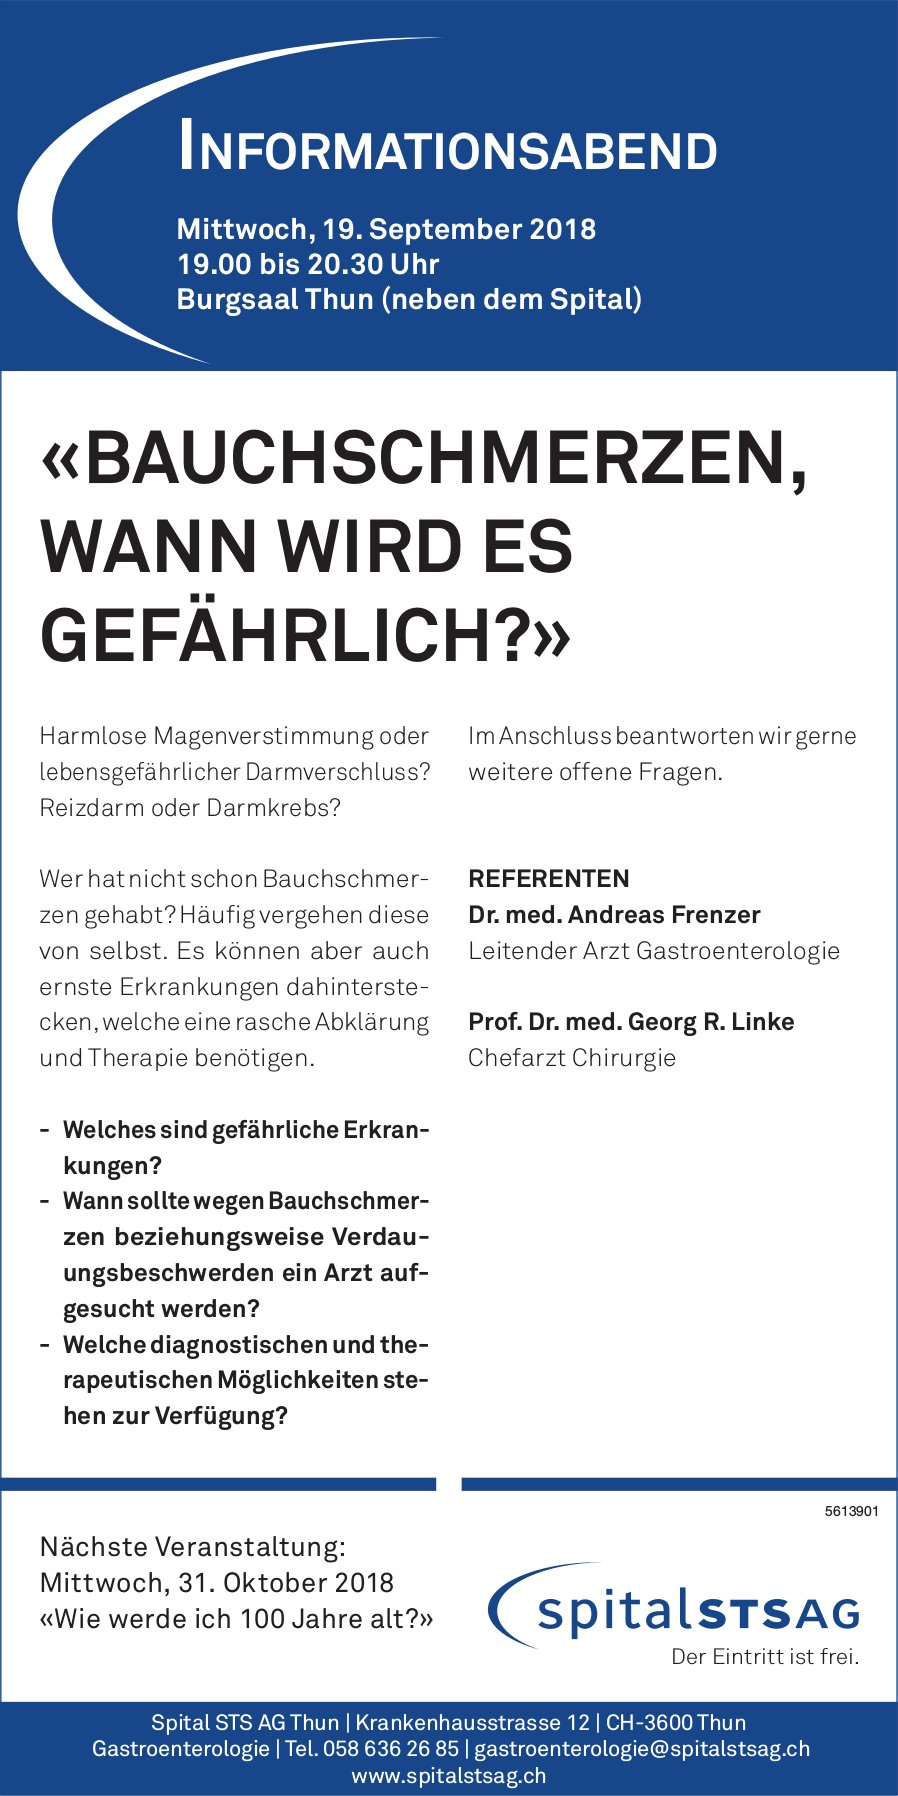 SPITAL STS AG - «BAUCHSCHMERZEN, WANN WIRD ES GEFÄHRLICH?» INFOABEND AM 19. SEPT.